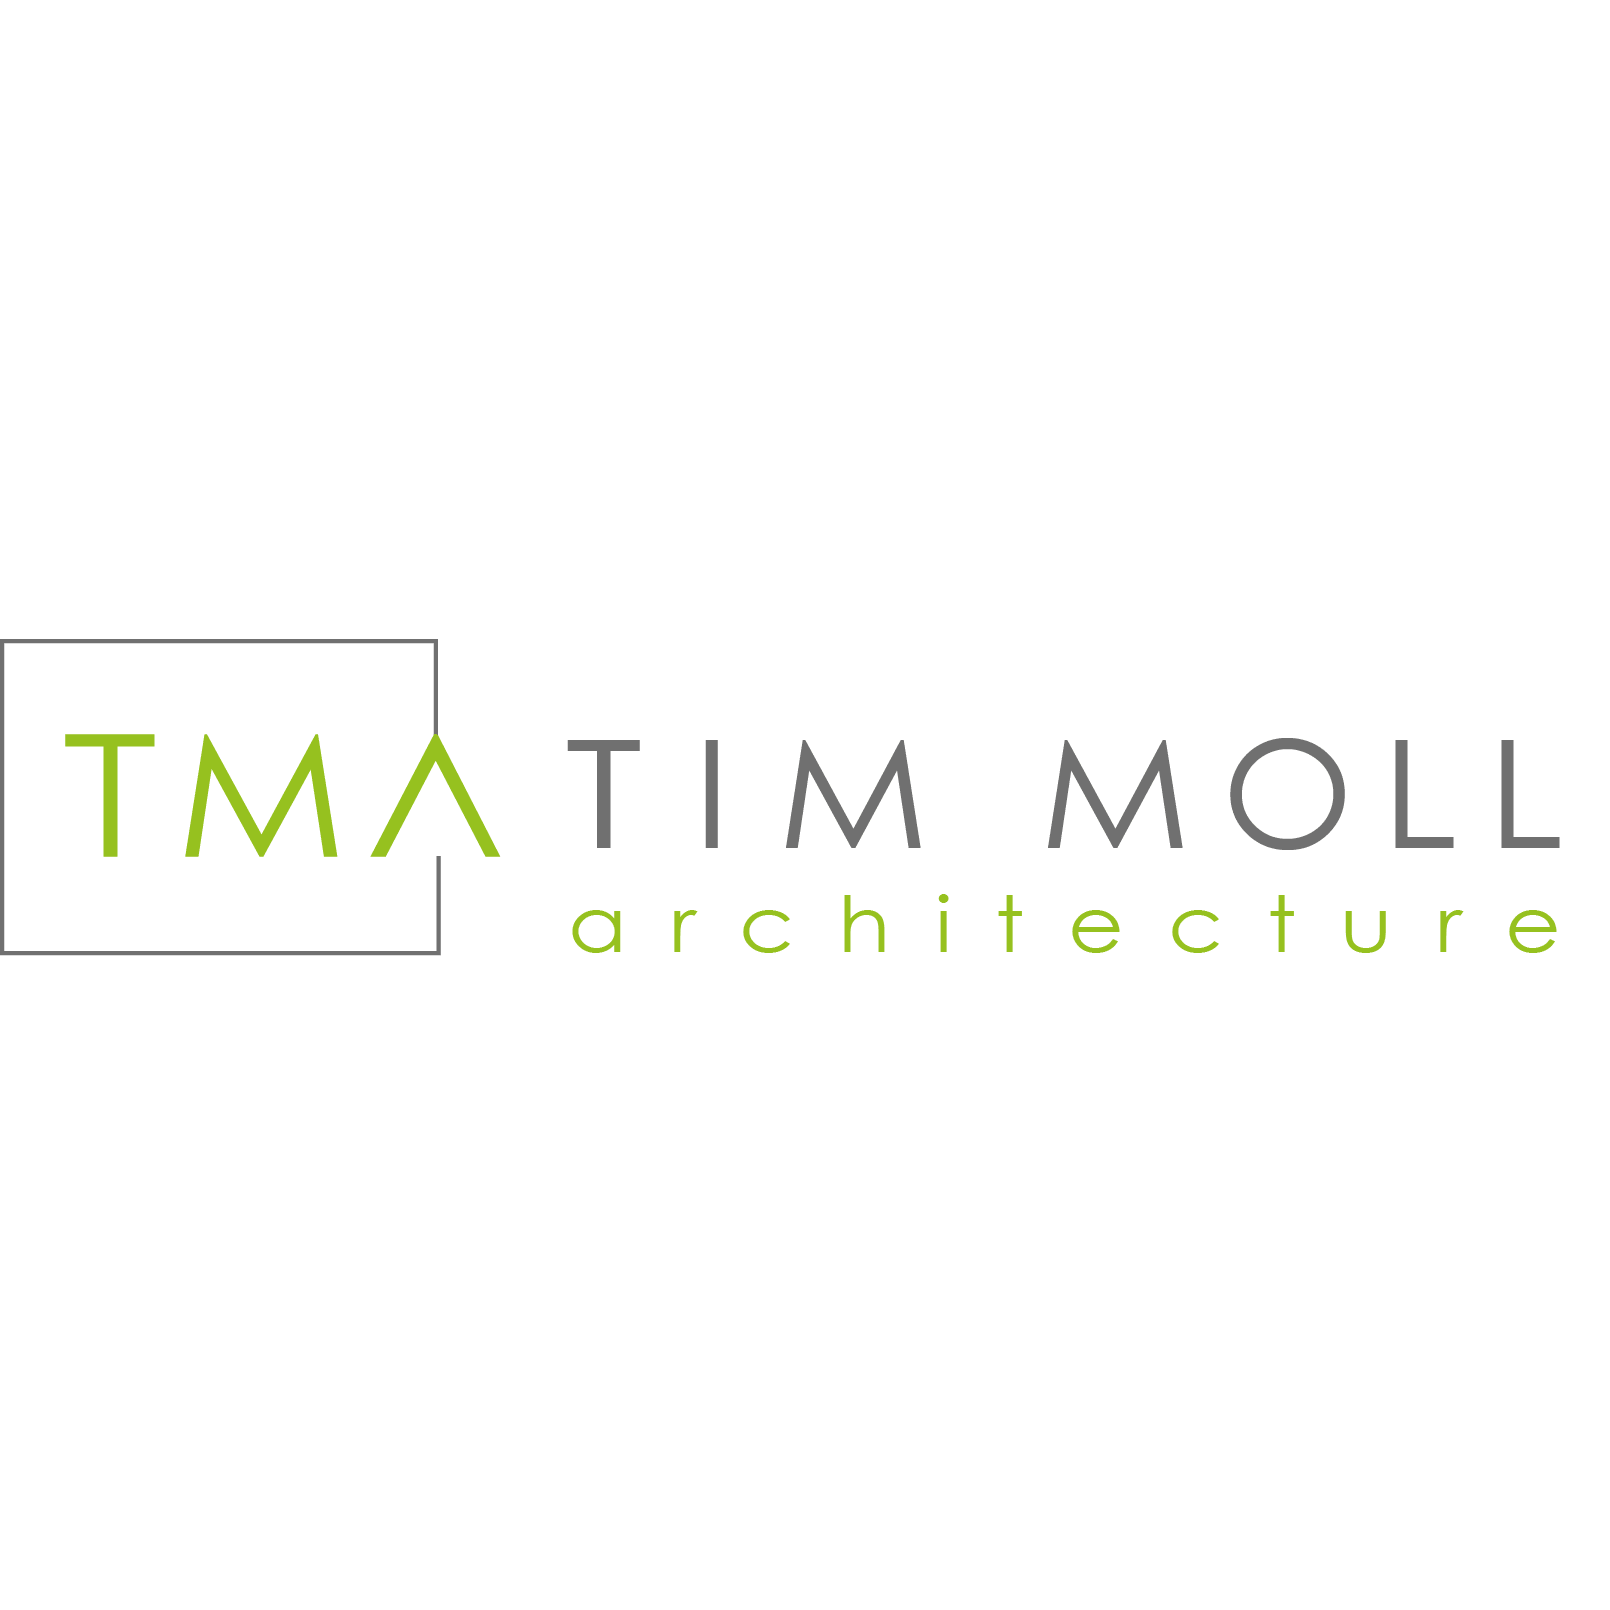 Tim Moll Architecture Ltd - Ipswich, Essex IP6 8AS - 01359 270841   ShowMeLocal.com